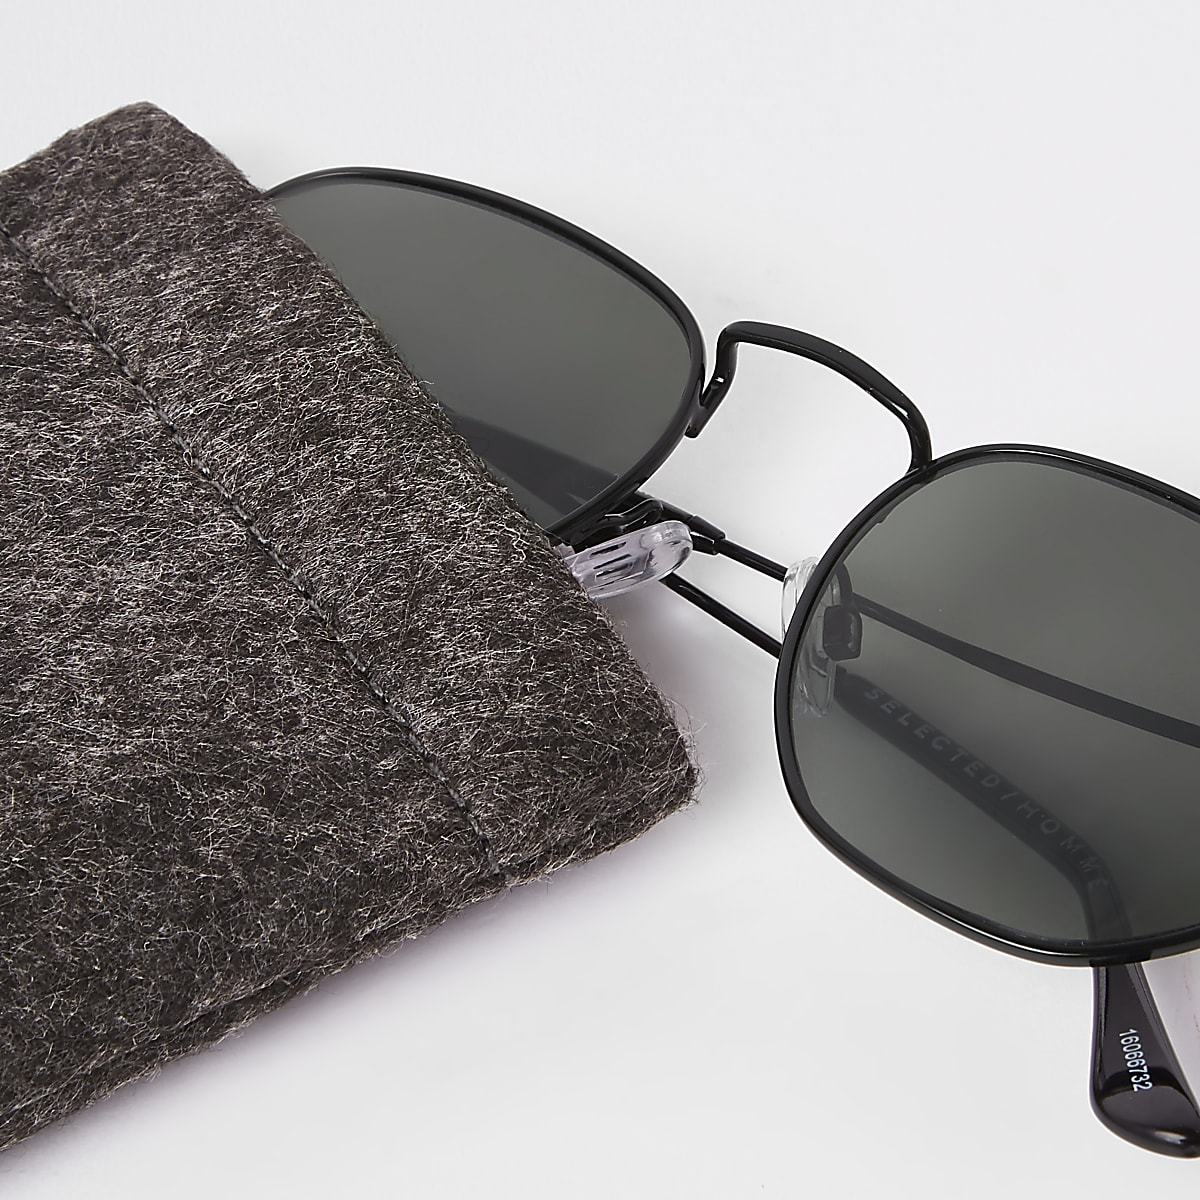 80a9942434f4e3 Selected Homme - Zwarte zeshoekige zonnebril - Retro zonnebrillen ...